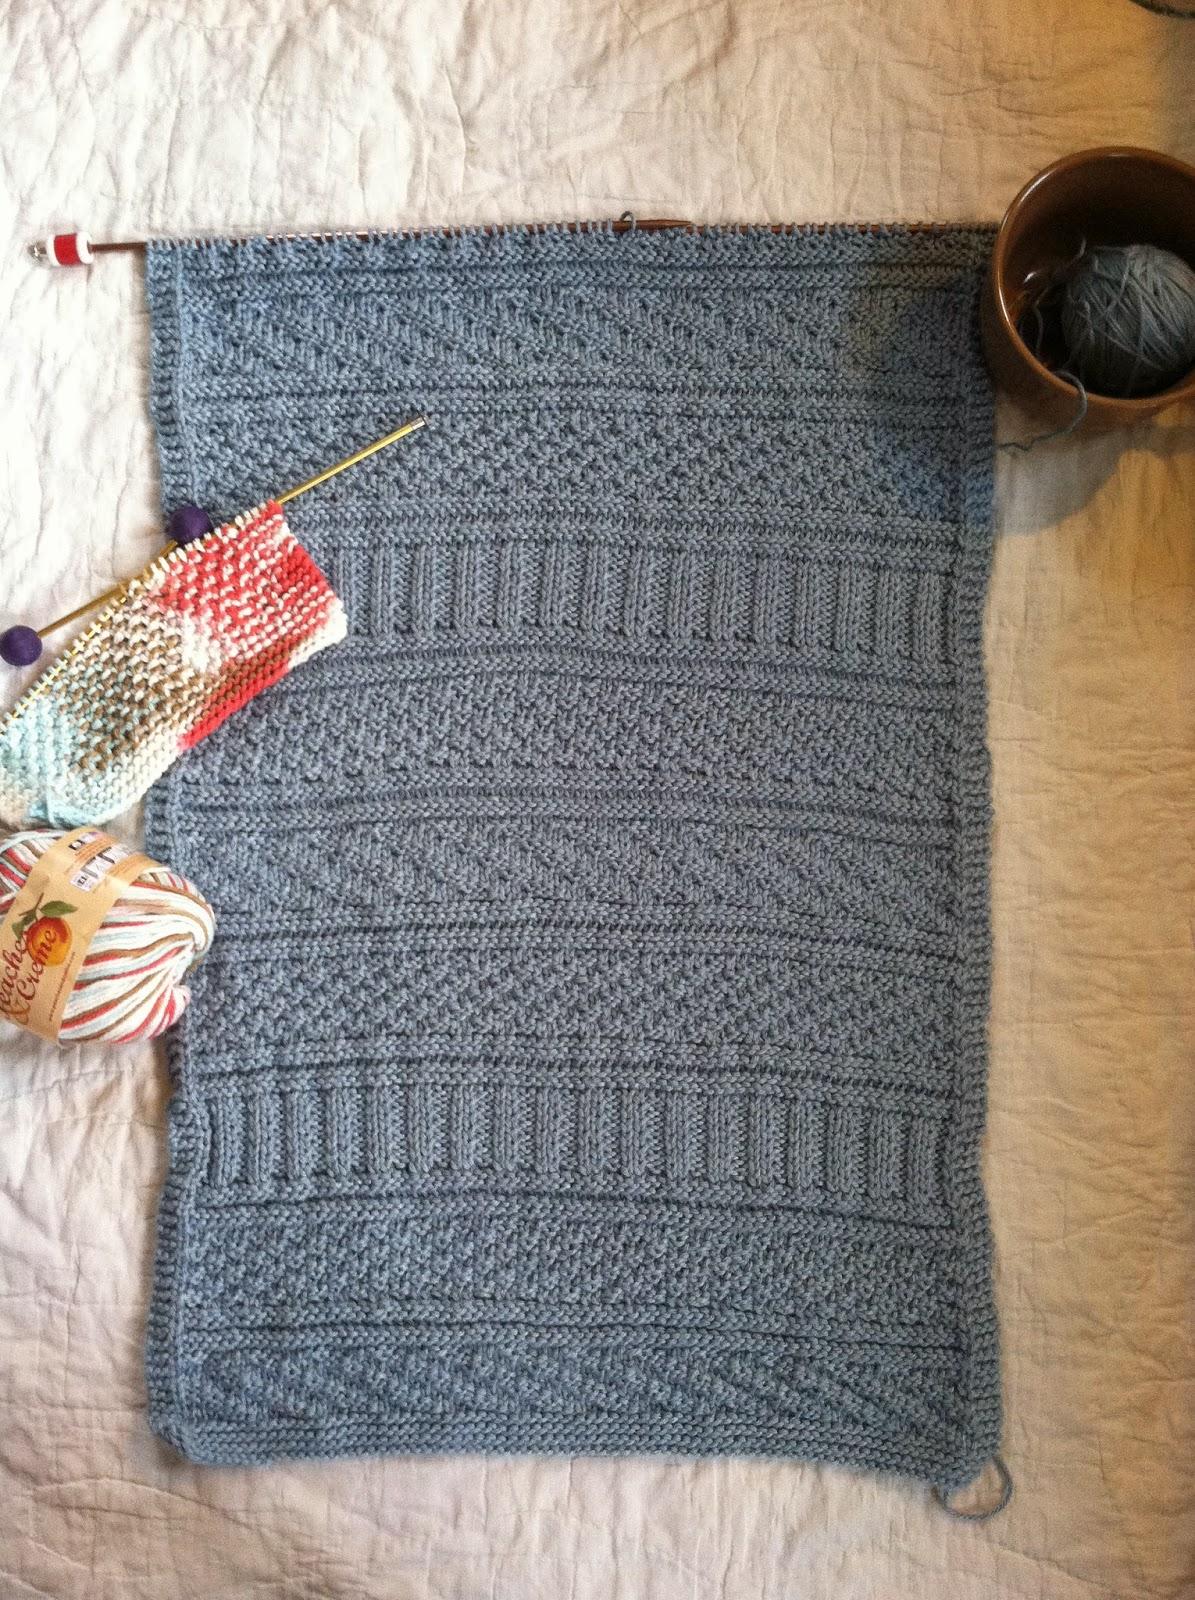 WIP Wednesday — Lots of Yarn!!